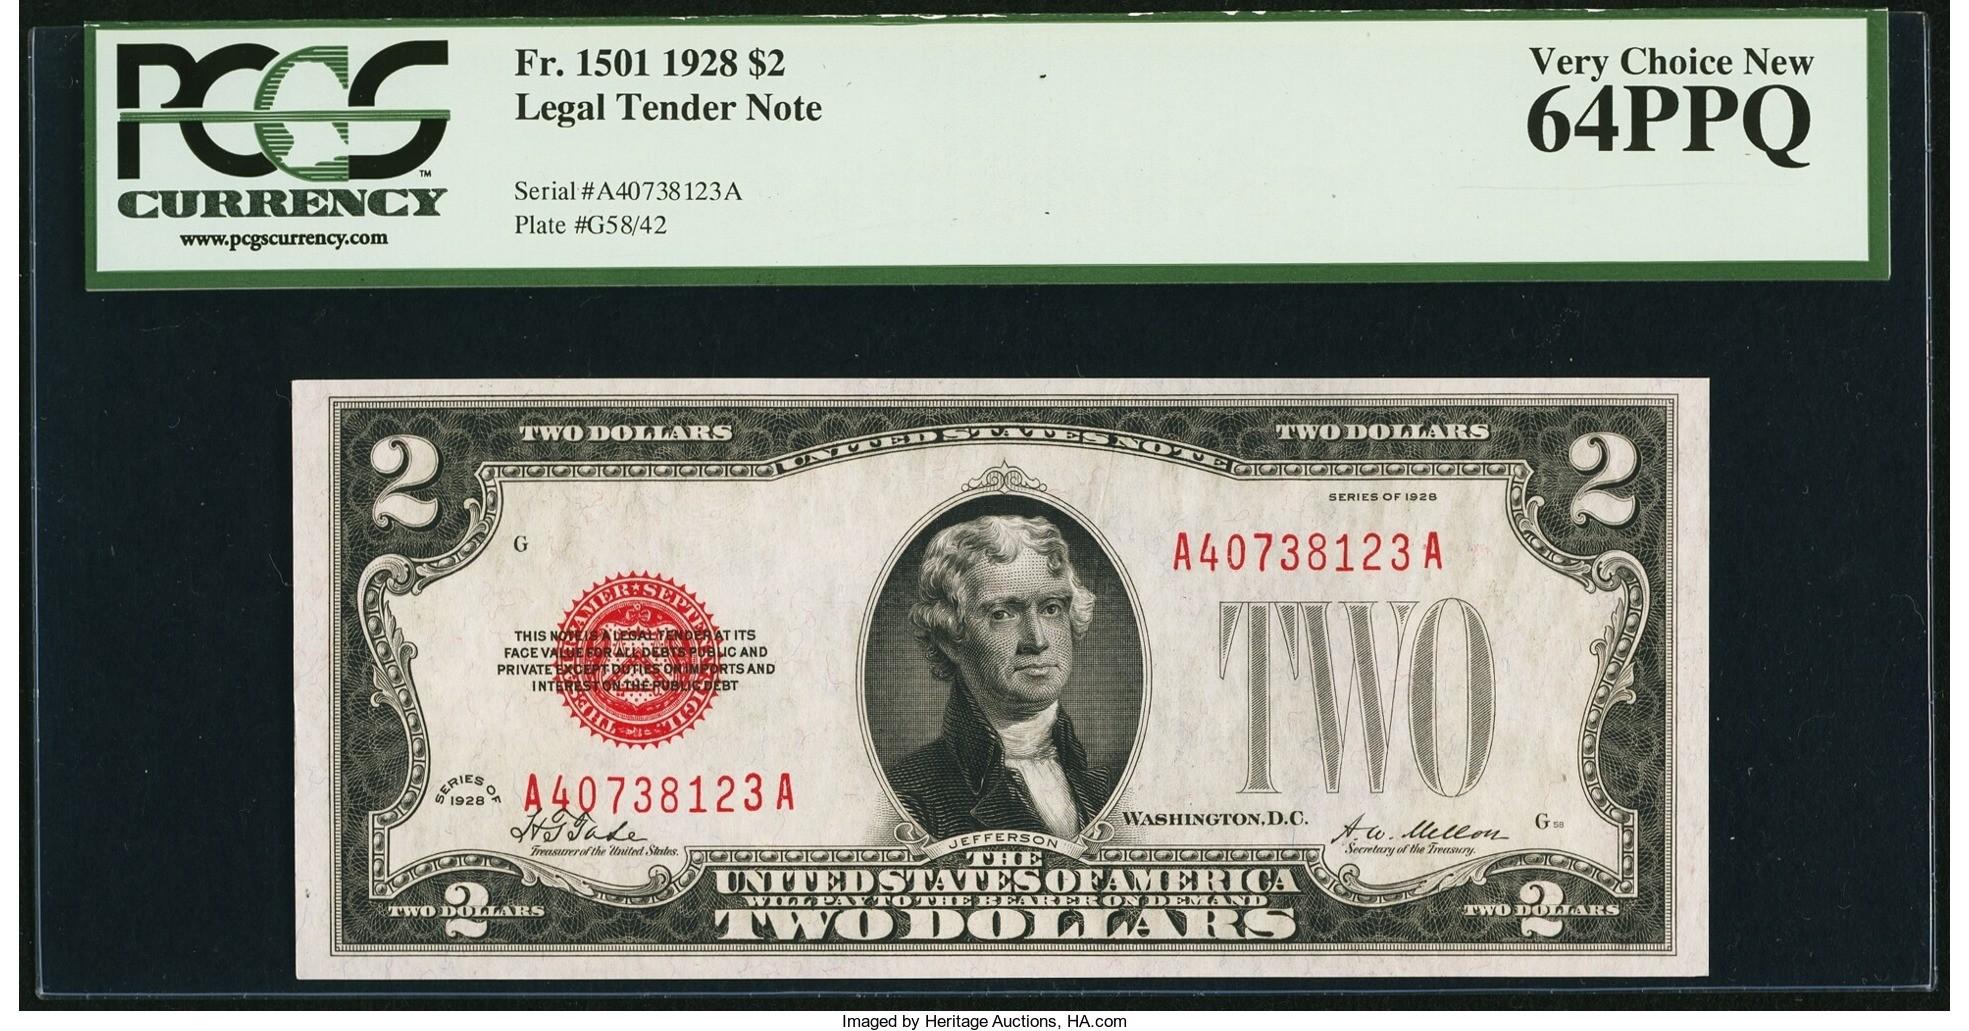 Fr. 1501 $2 1928 Legal Tender Note. PCGS Very Choice New 64PPQ $129.25.jpg